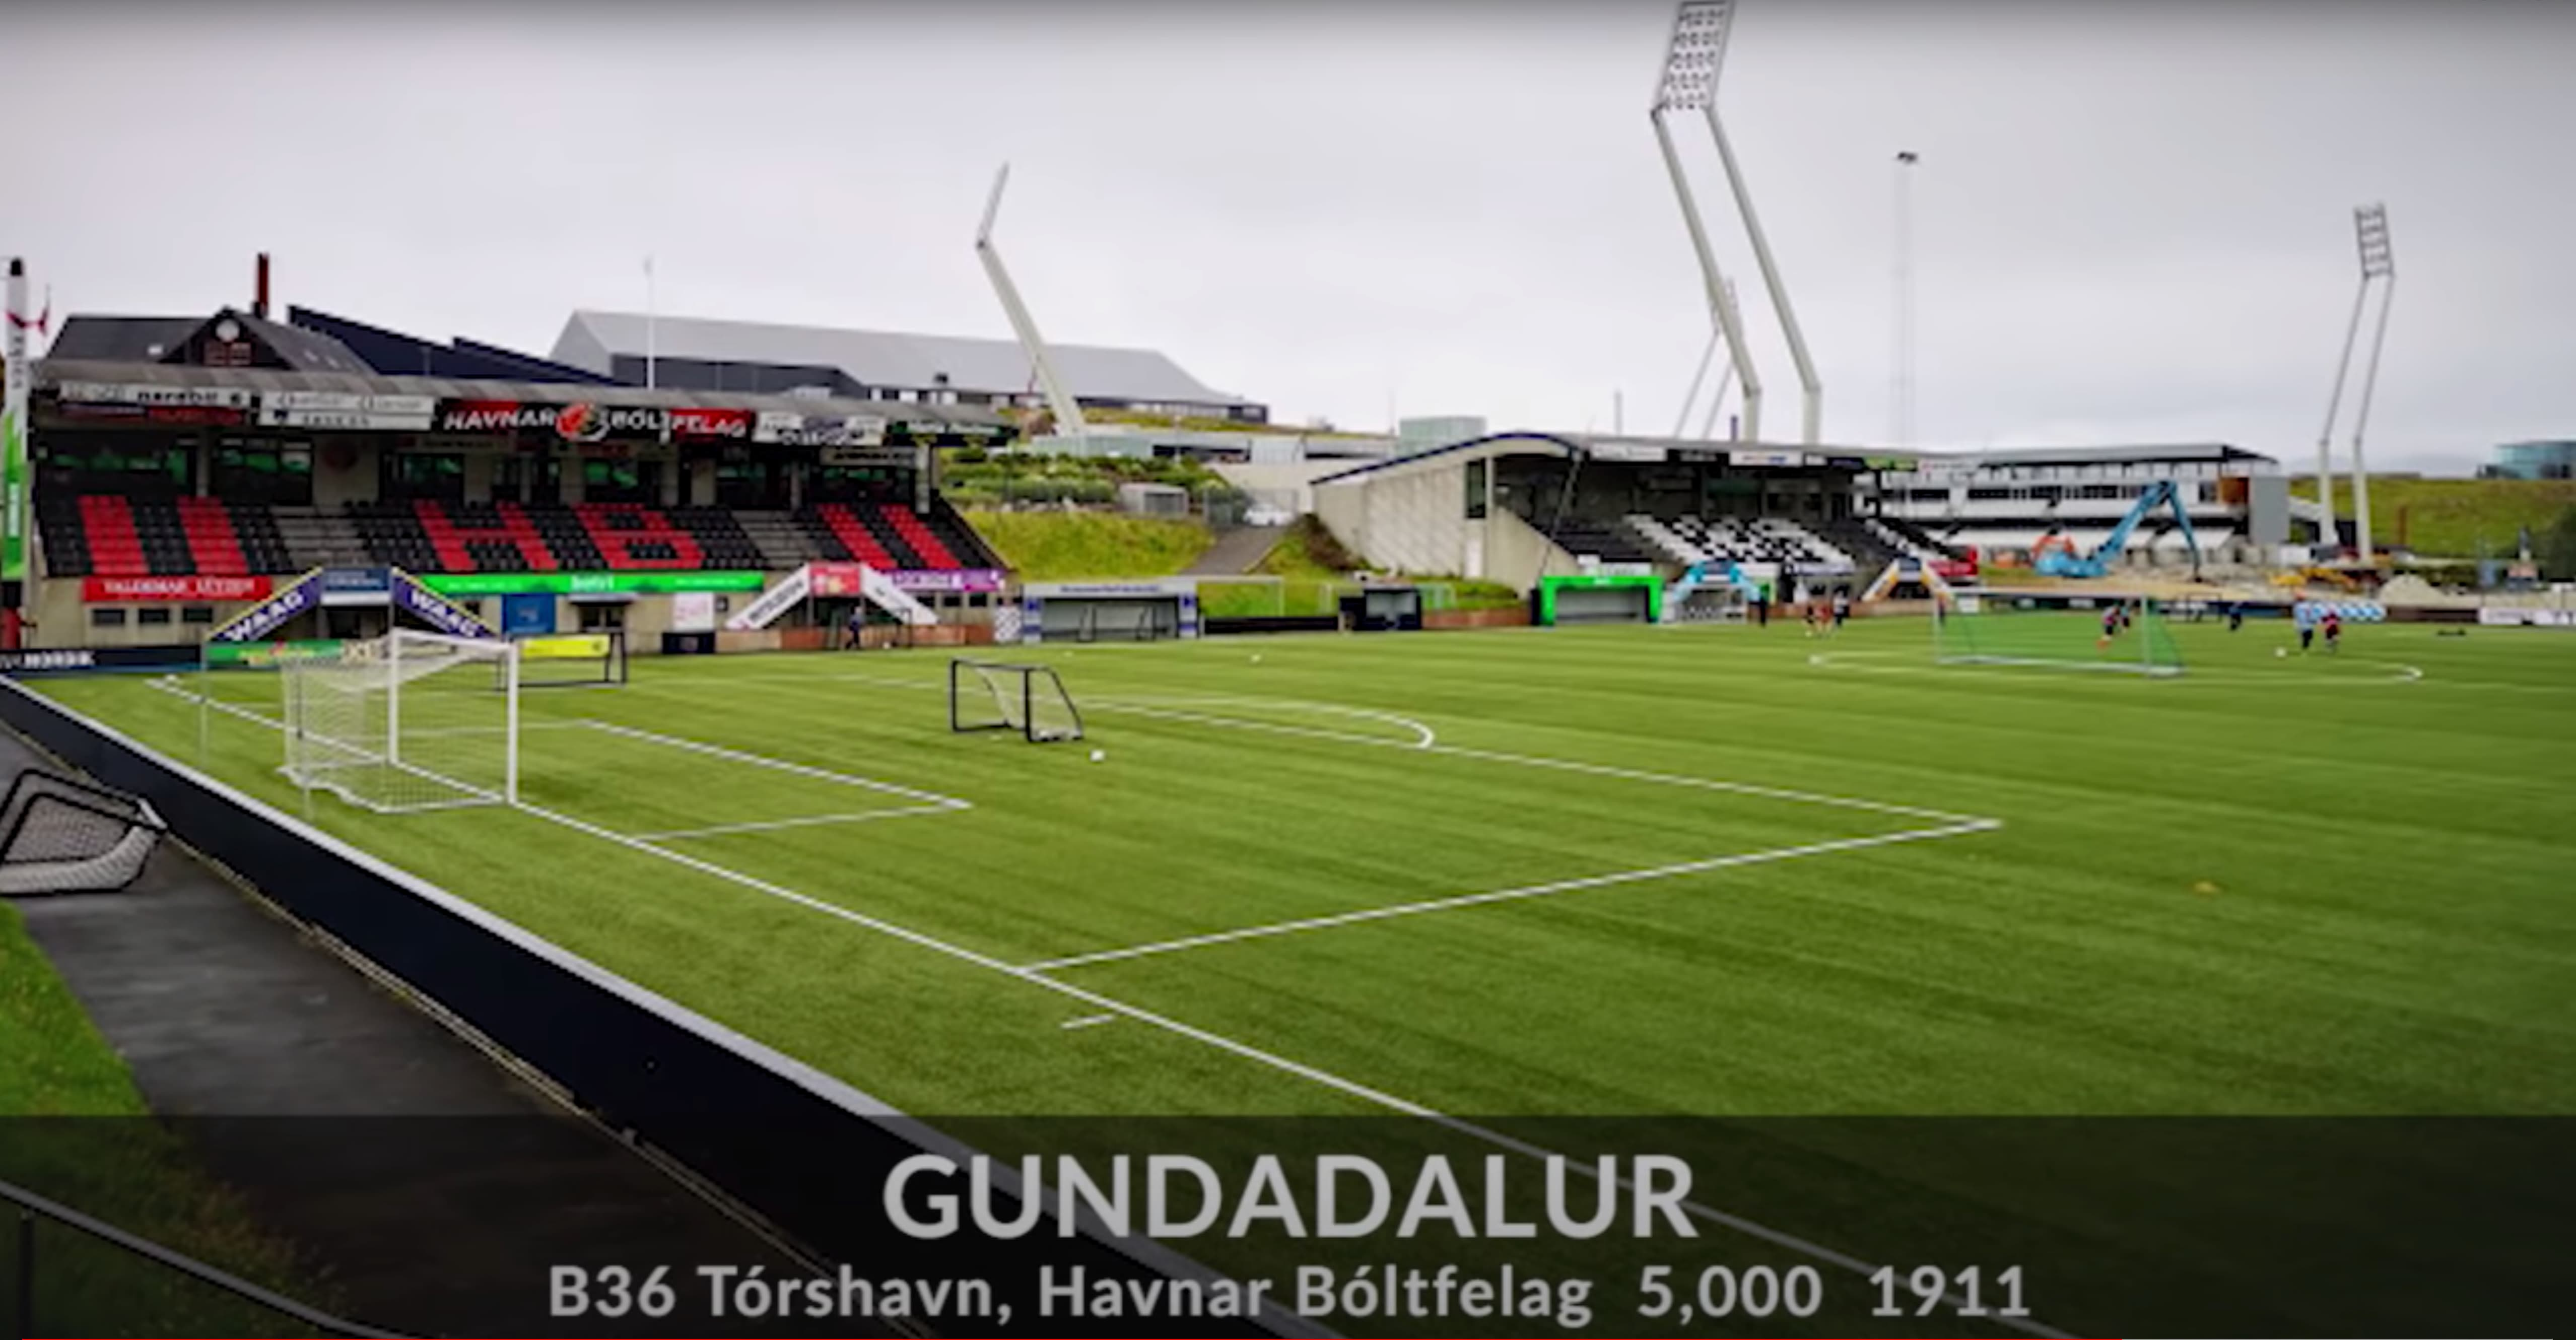 Havnar Bóltfelag (HB Torshavn) stadium from the Faroe Islands Premier League